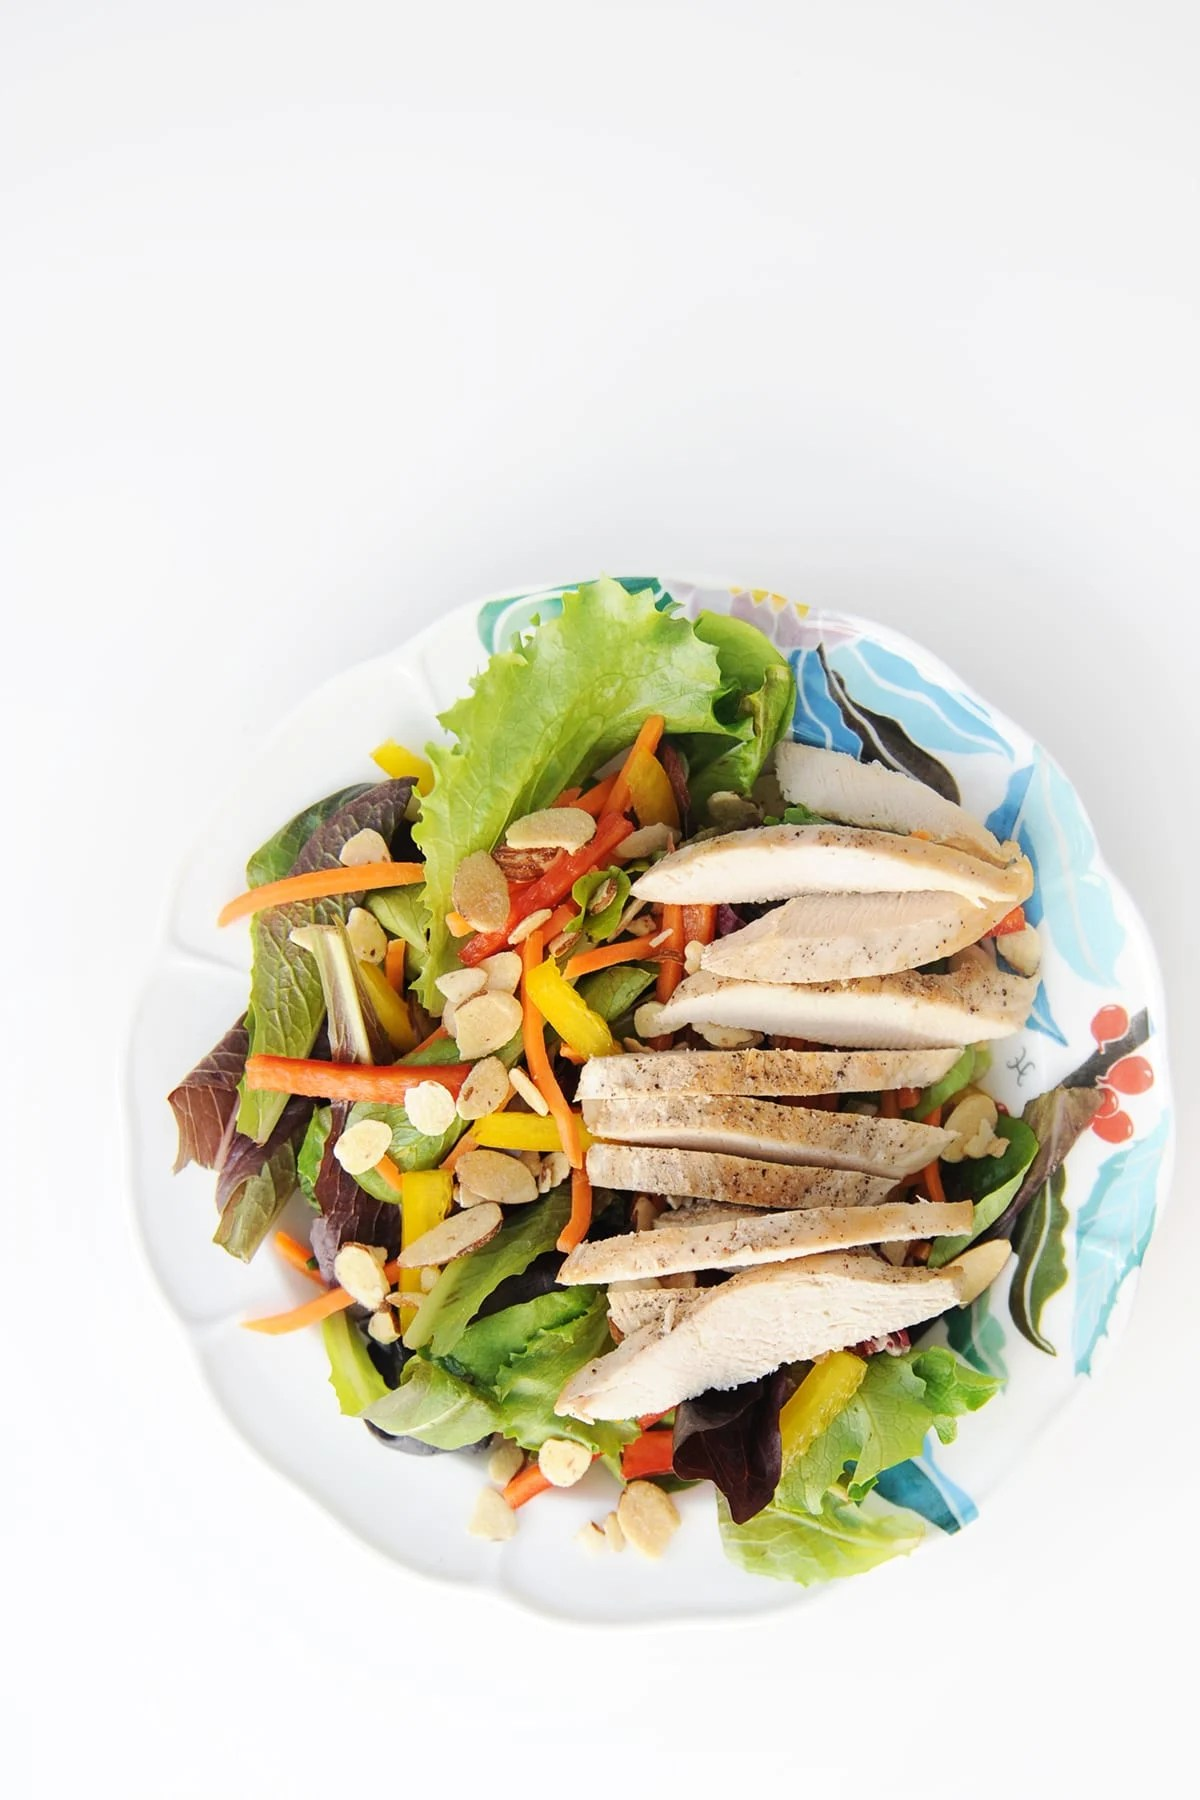 nordstrom cafe recipes for salads